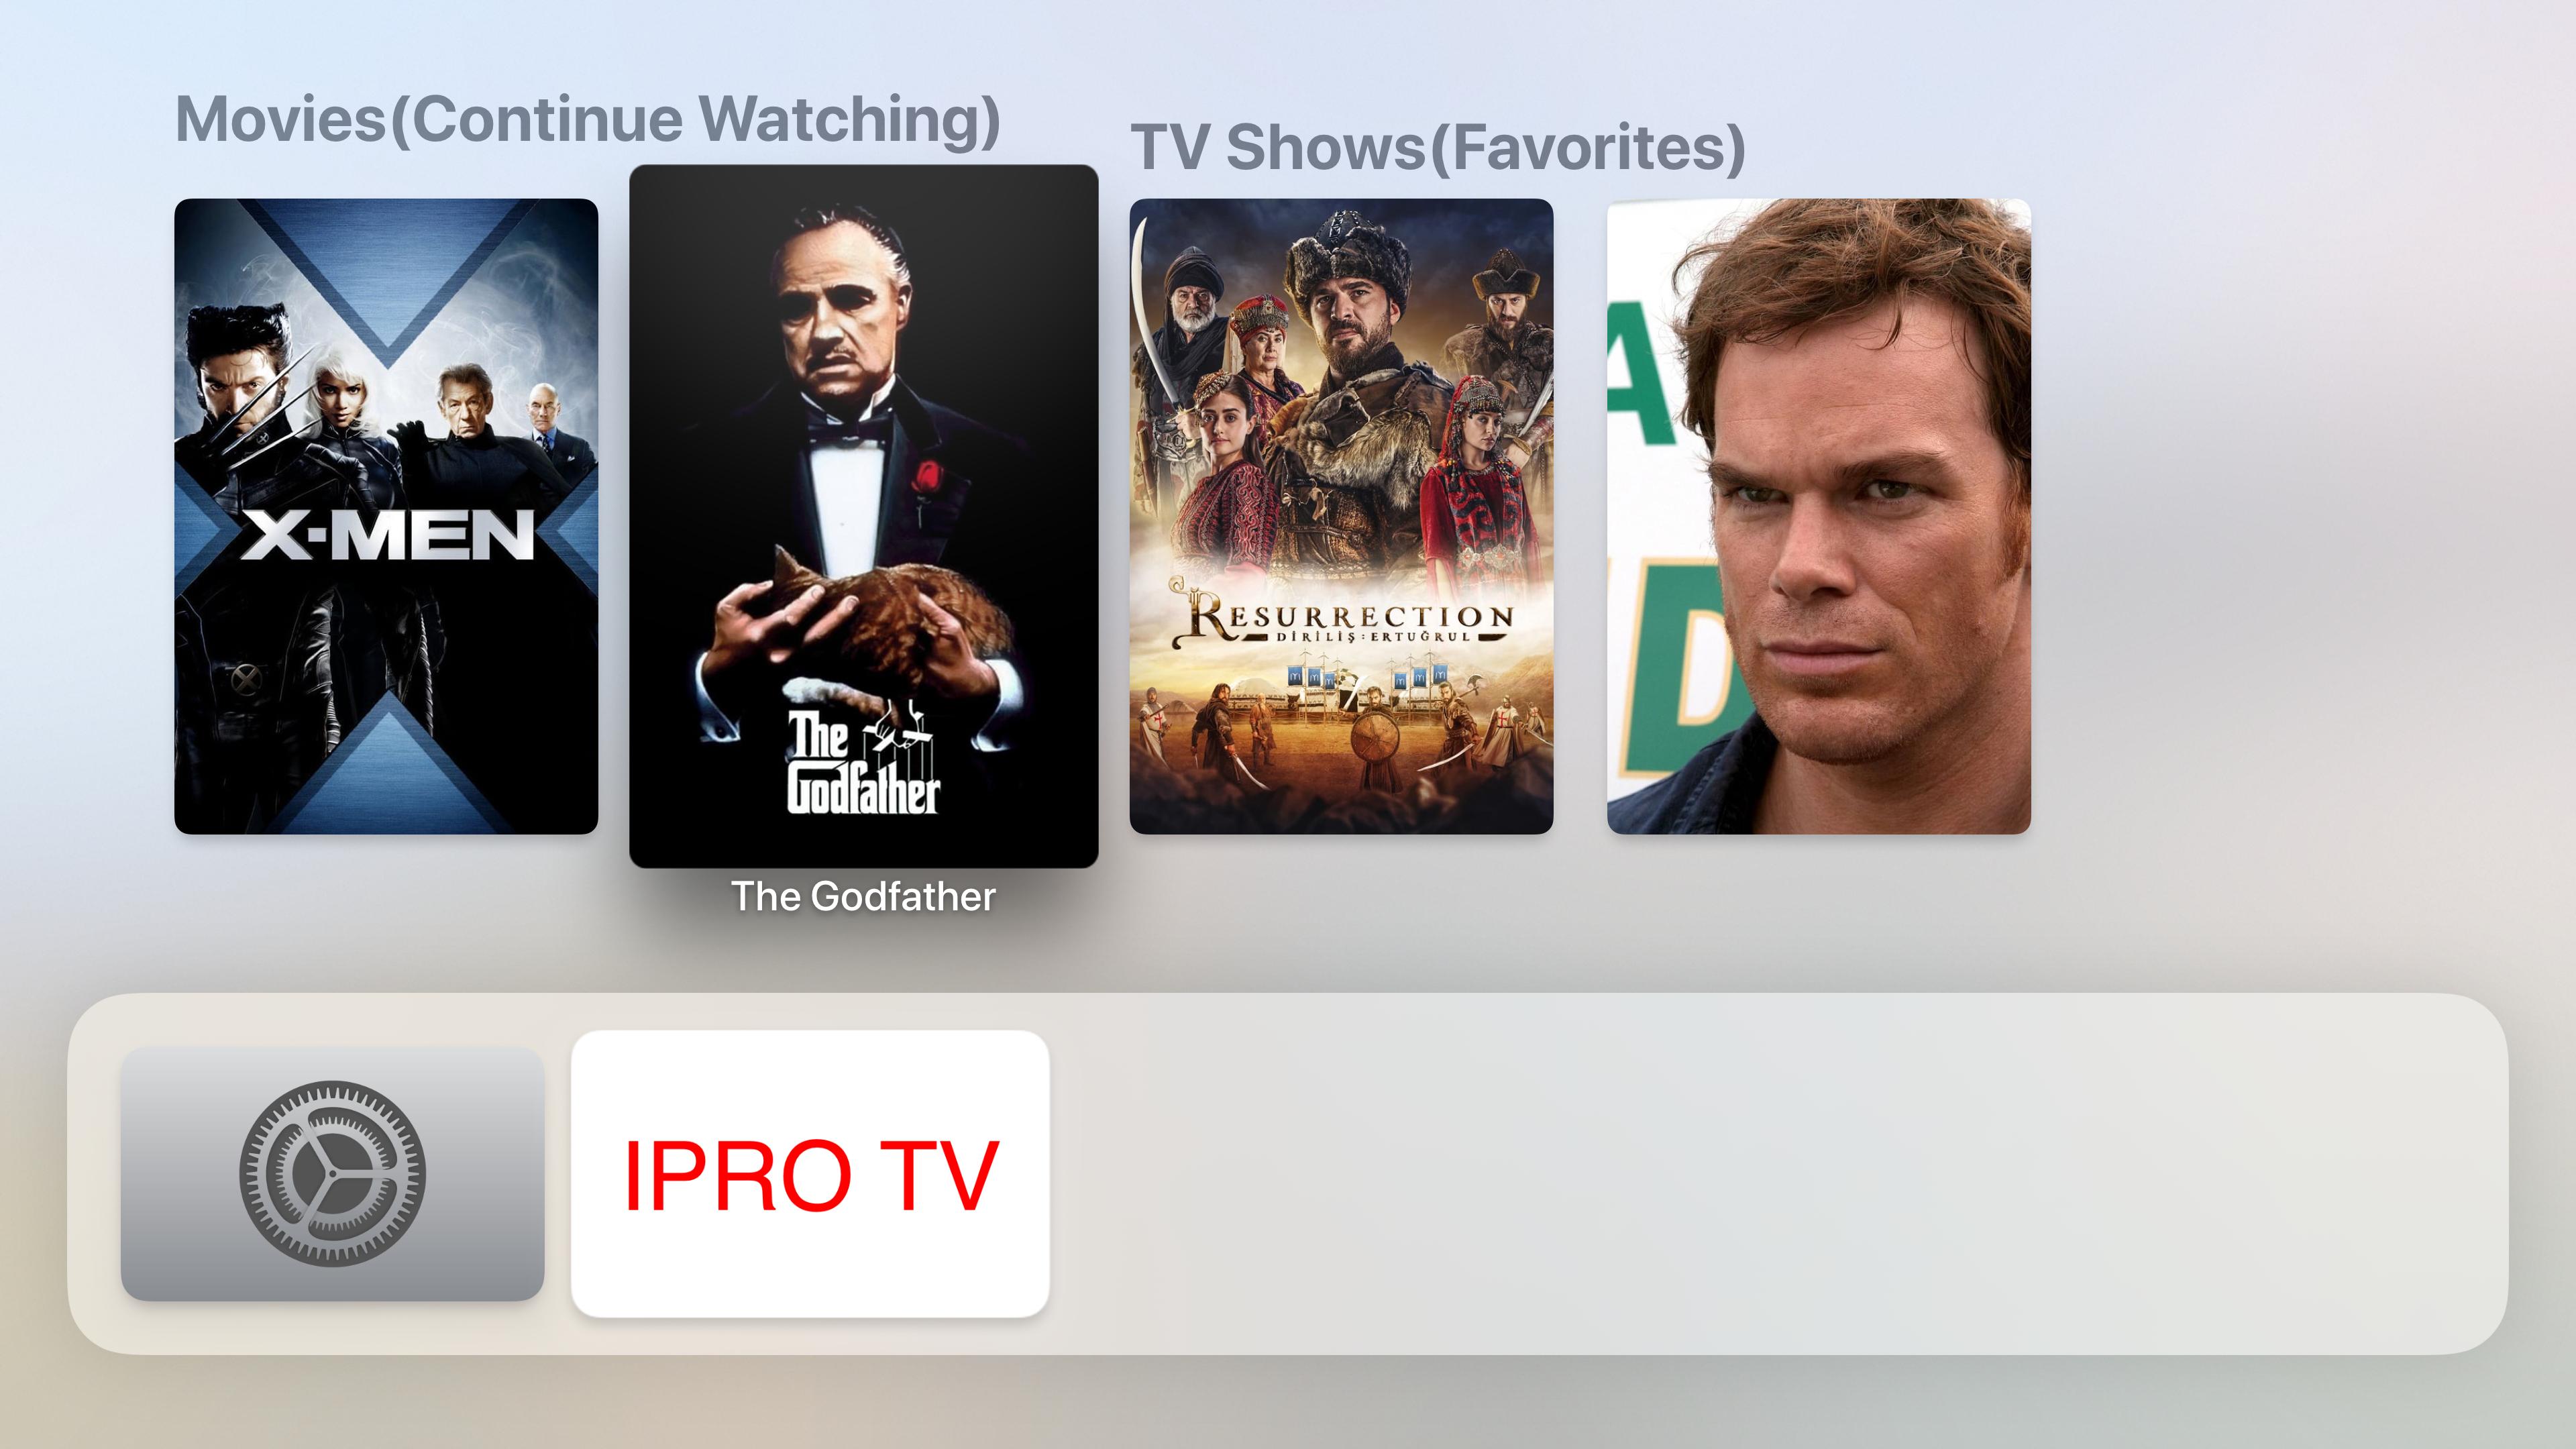 iProTV for iPtv & m3u content screenshot 26